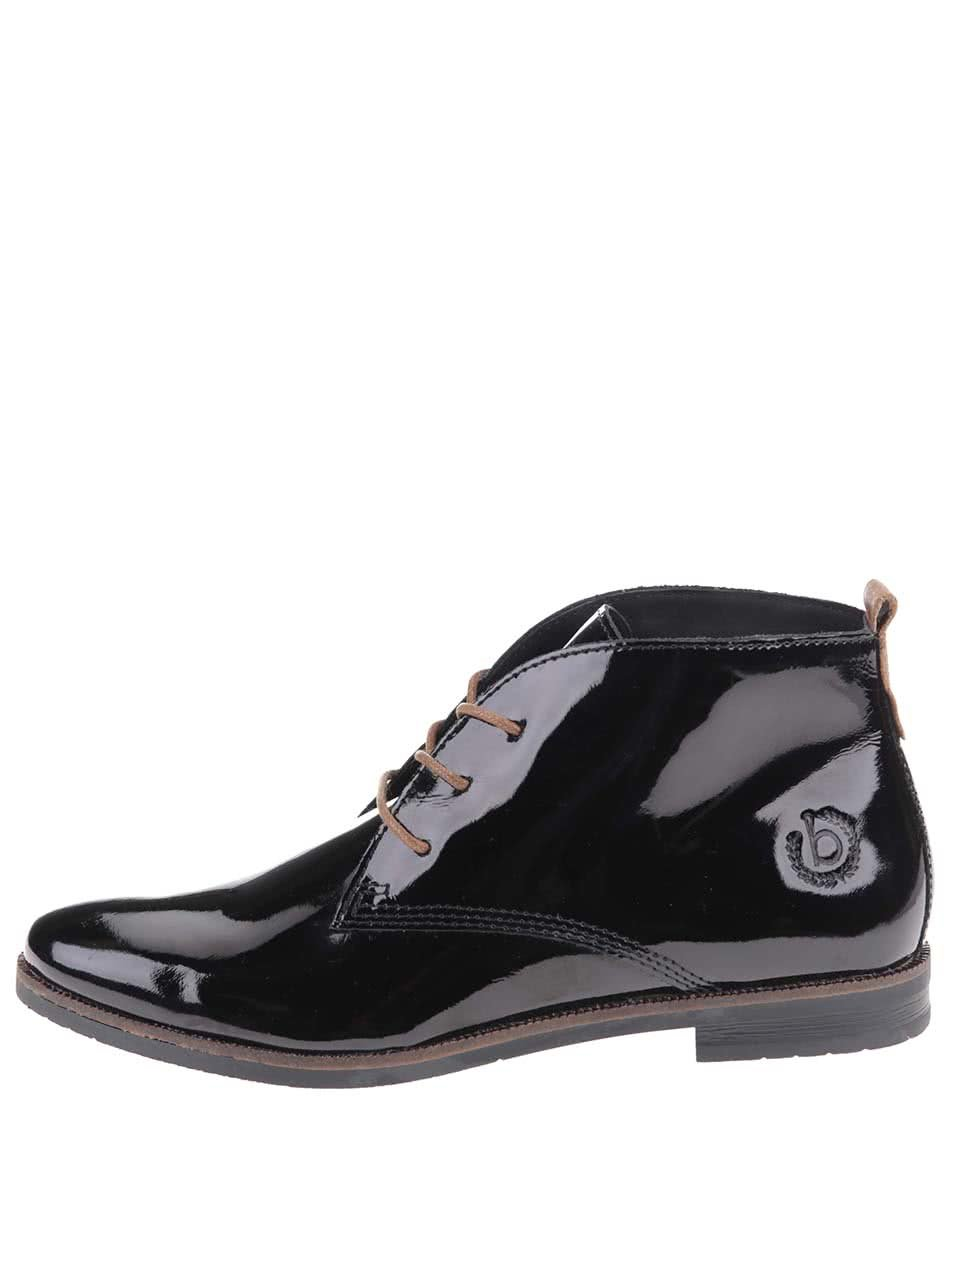 9e0c33b987b Černé dámské kožené lesklé boty bugatti Faith ...